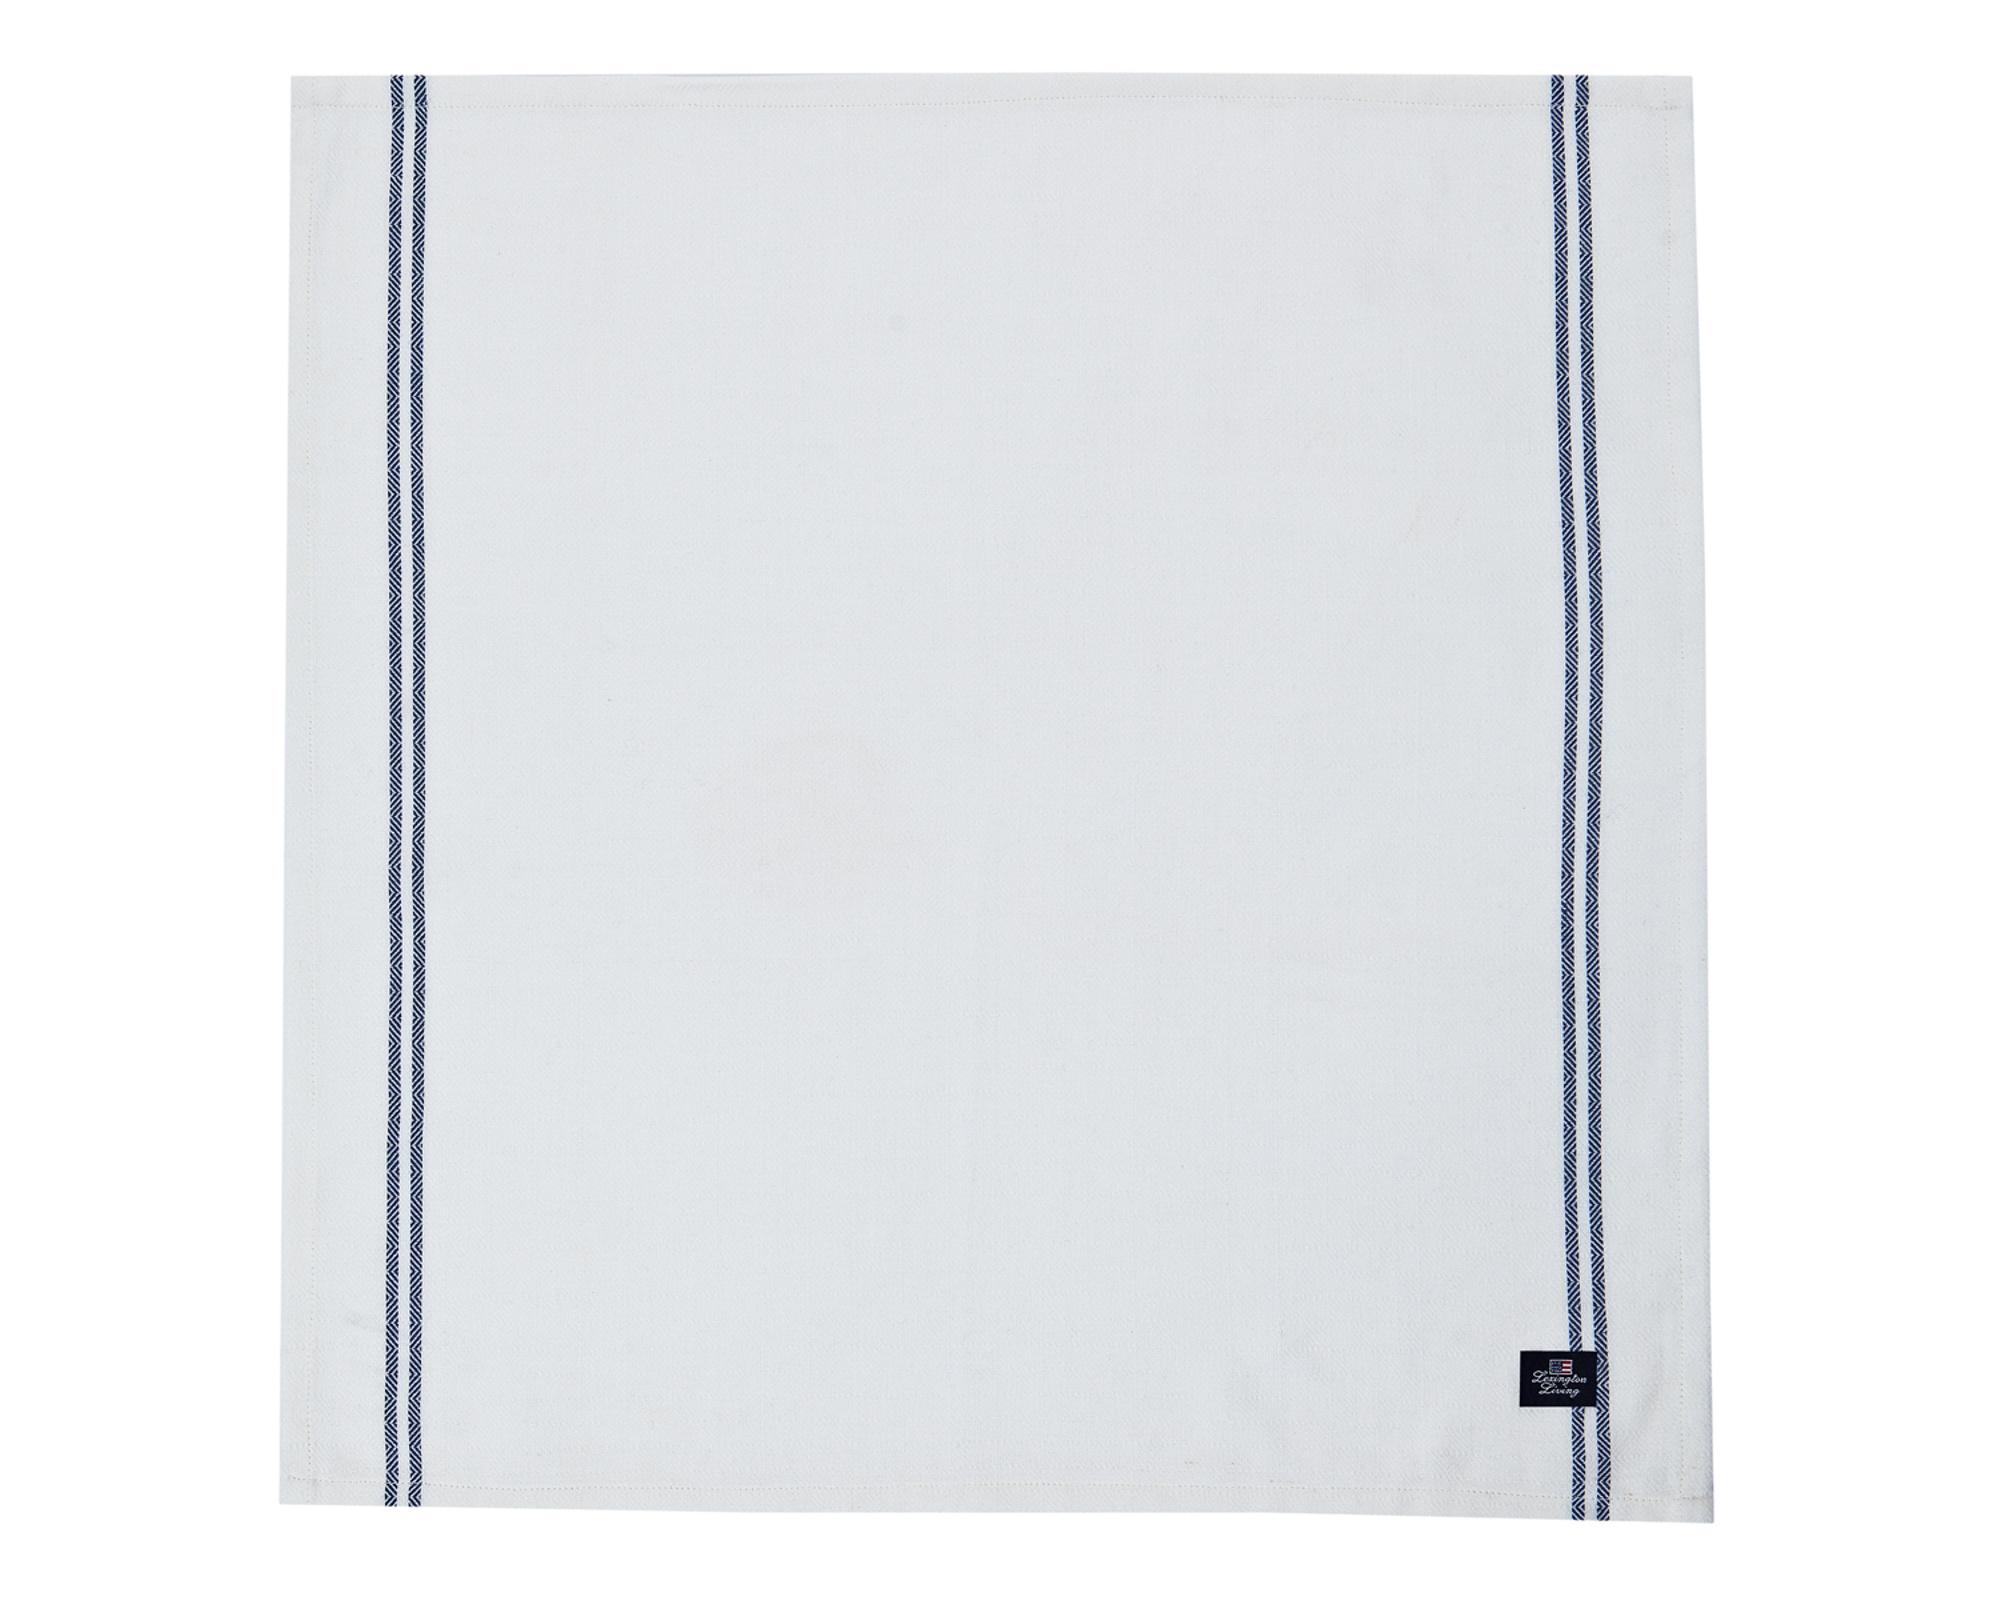 Structured Napkin, White/Blue